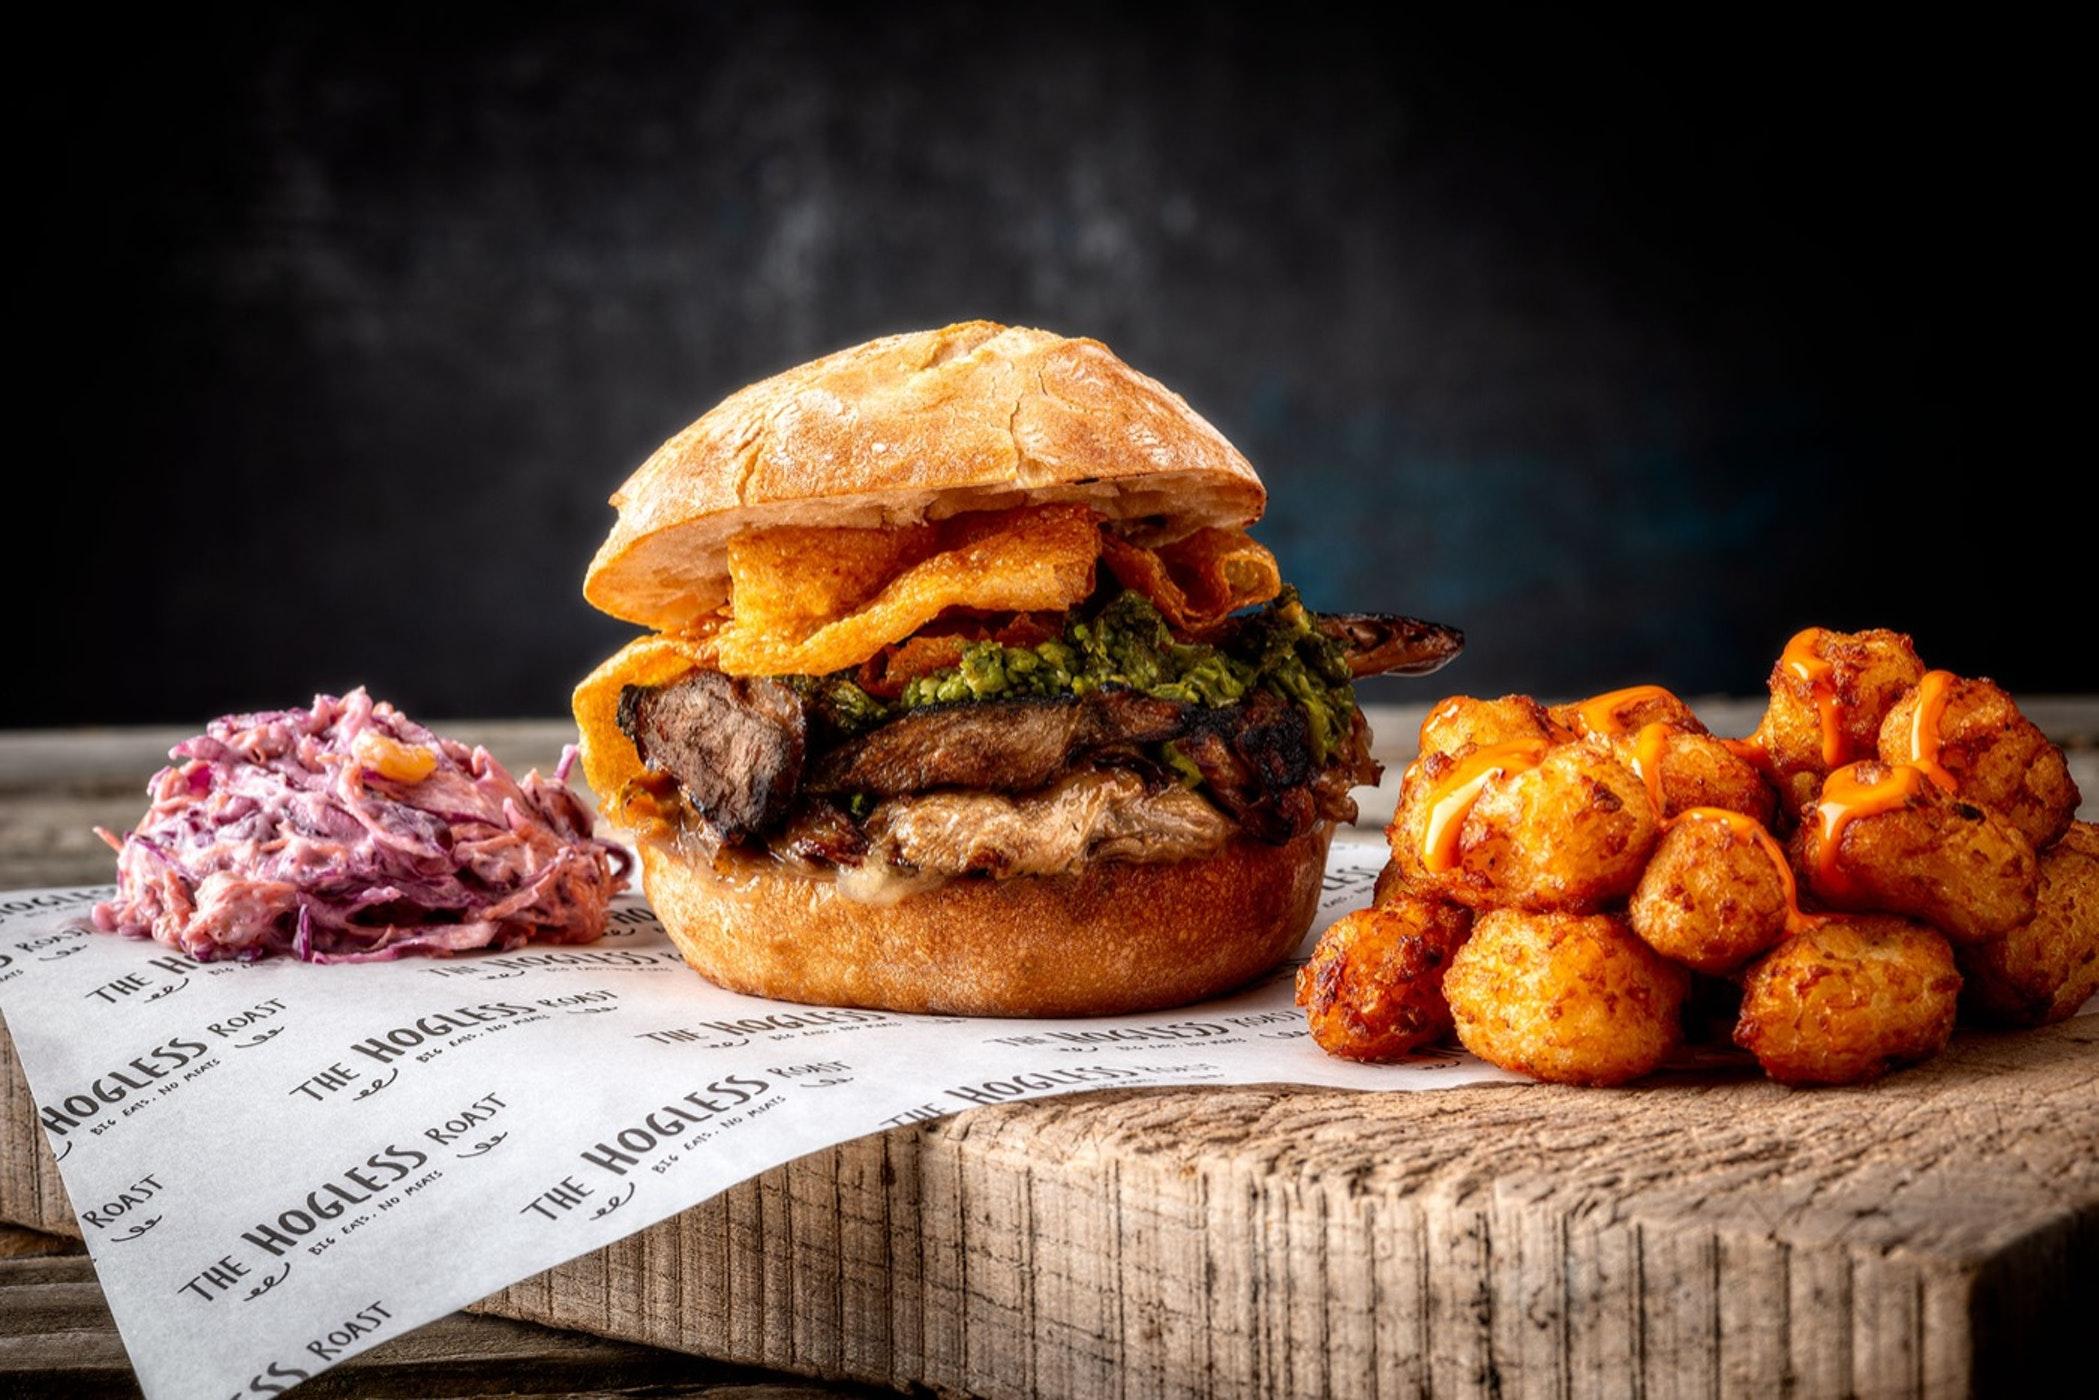 Hogless Roast - Vegan/Vegetarian